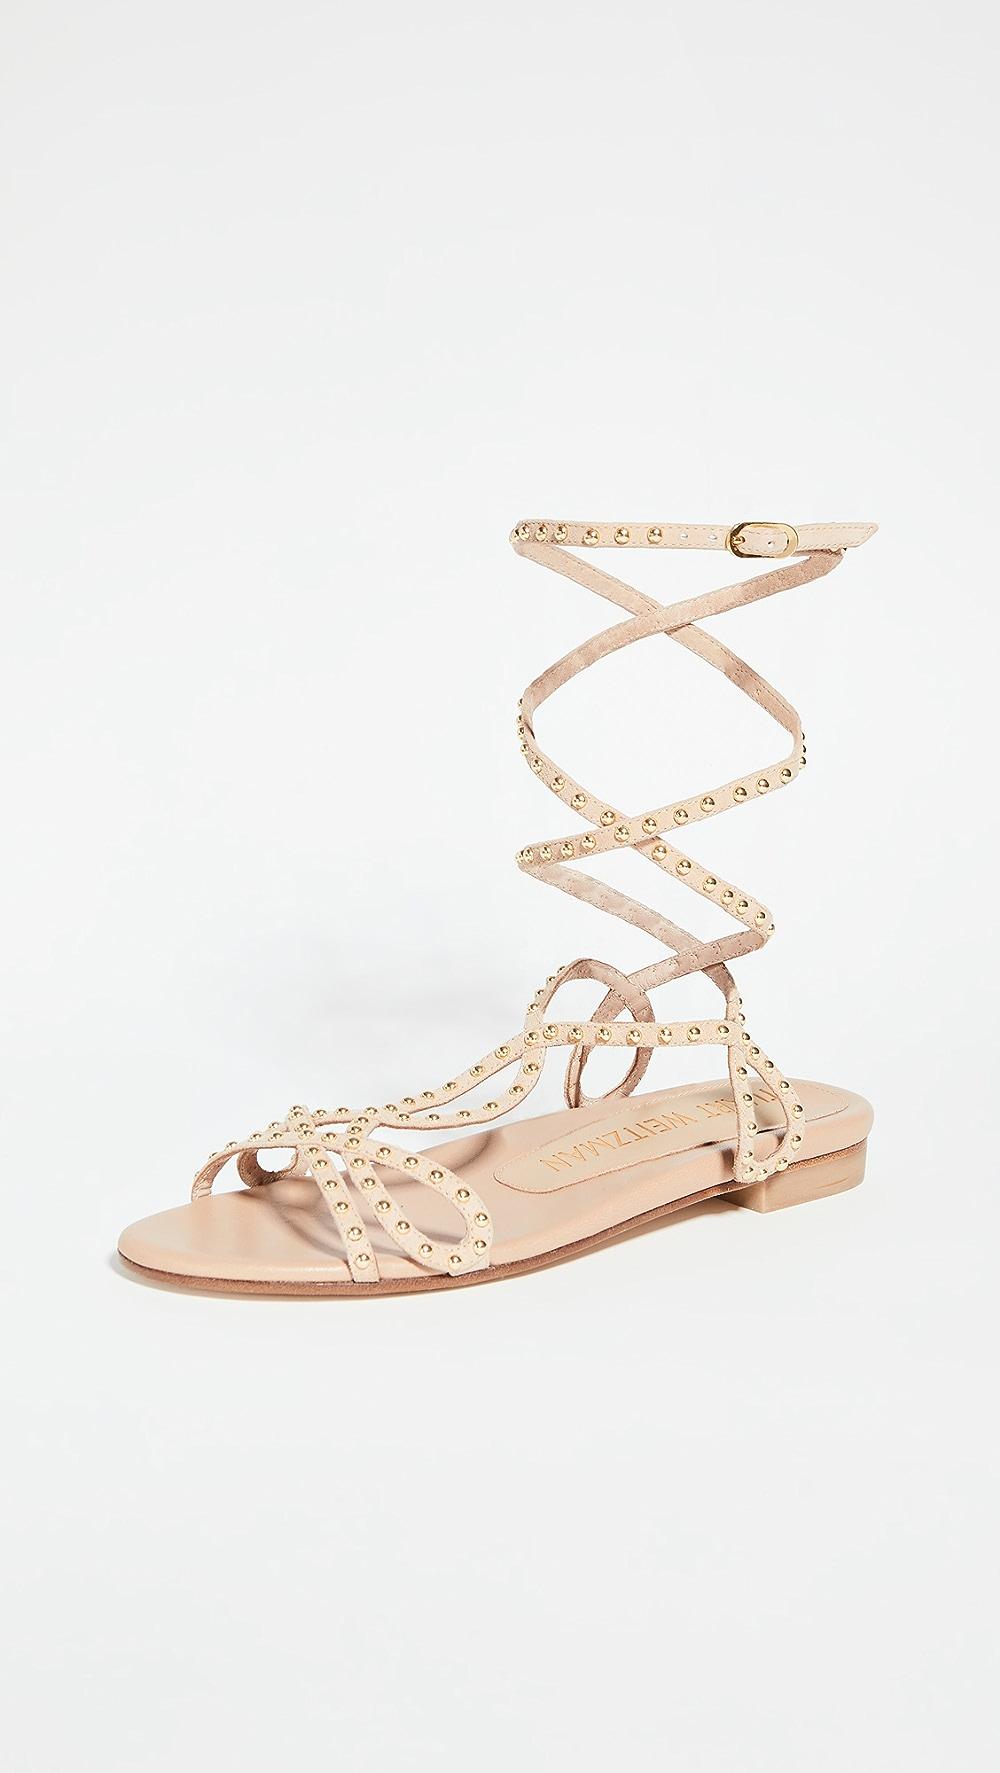 Reasonable Stuart Weitzman - Leya Bead Flat Sandals To Have A Long Historical Standing